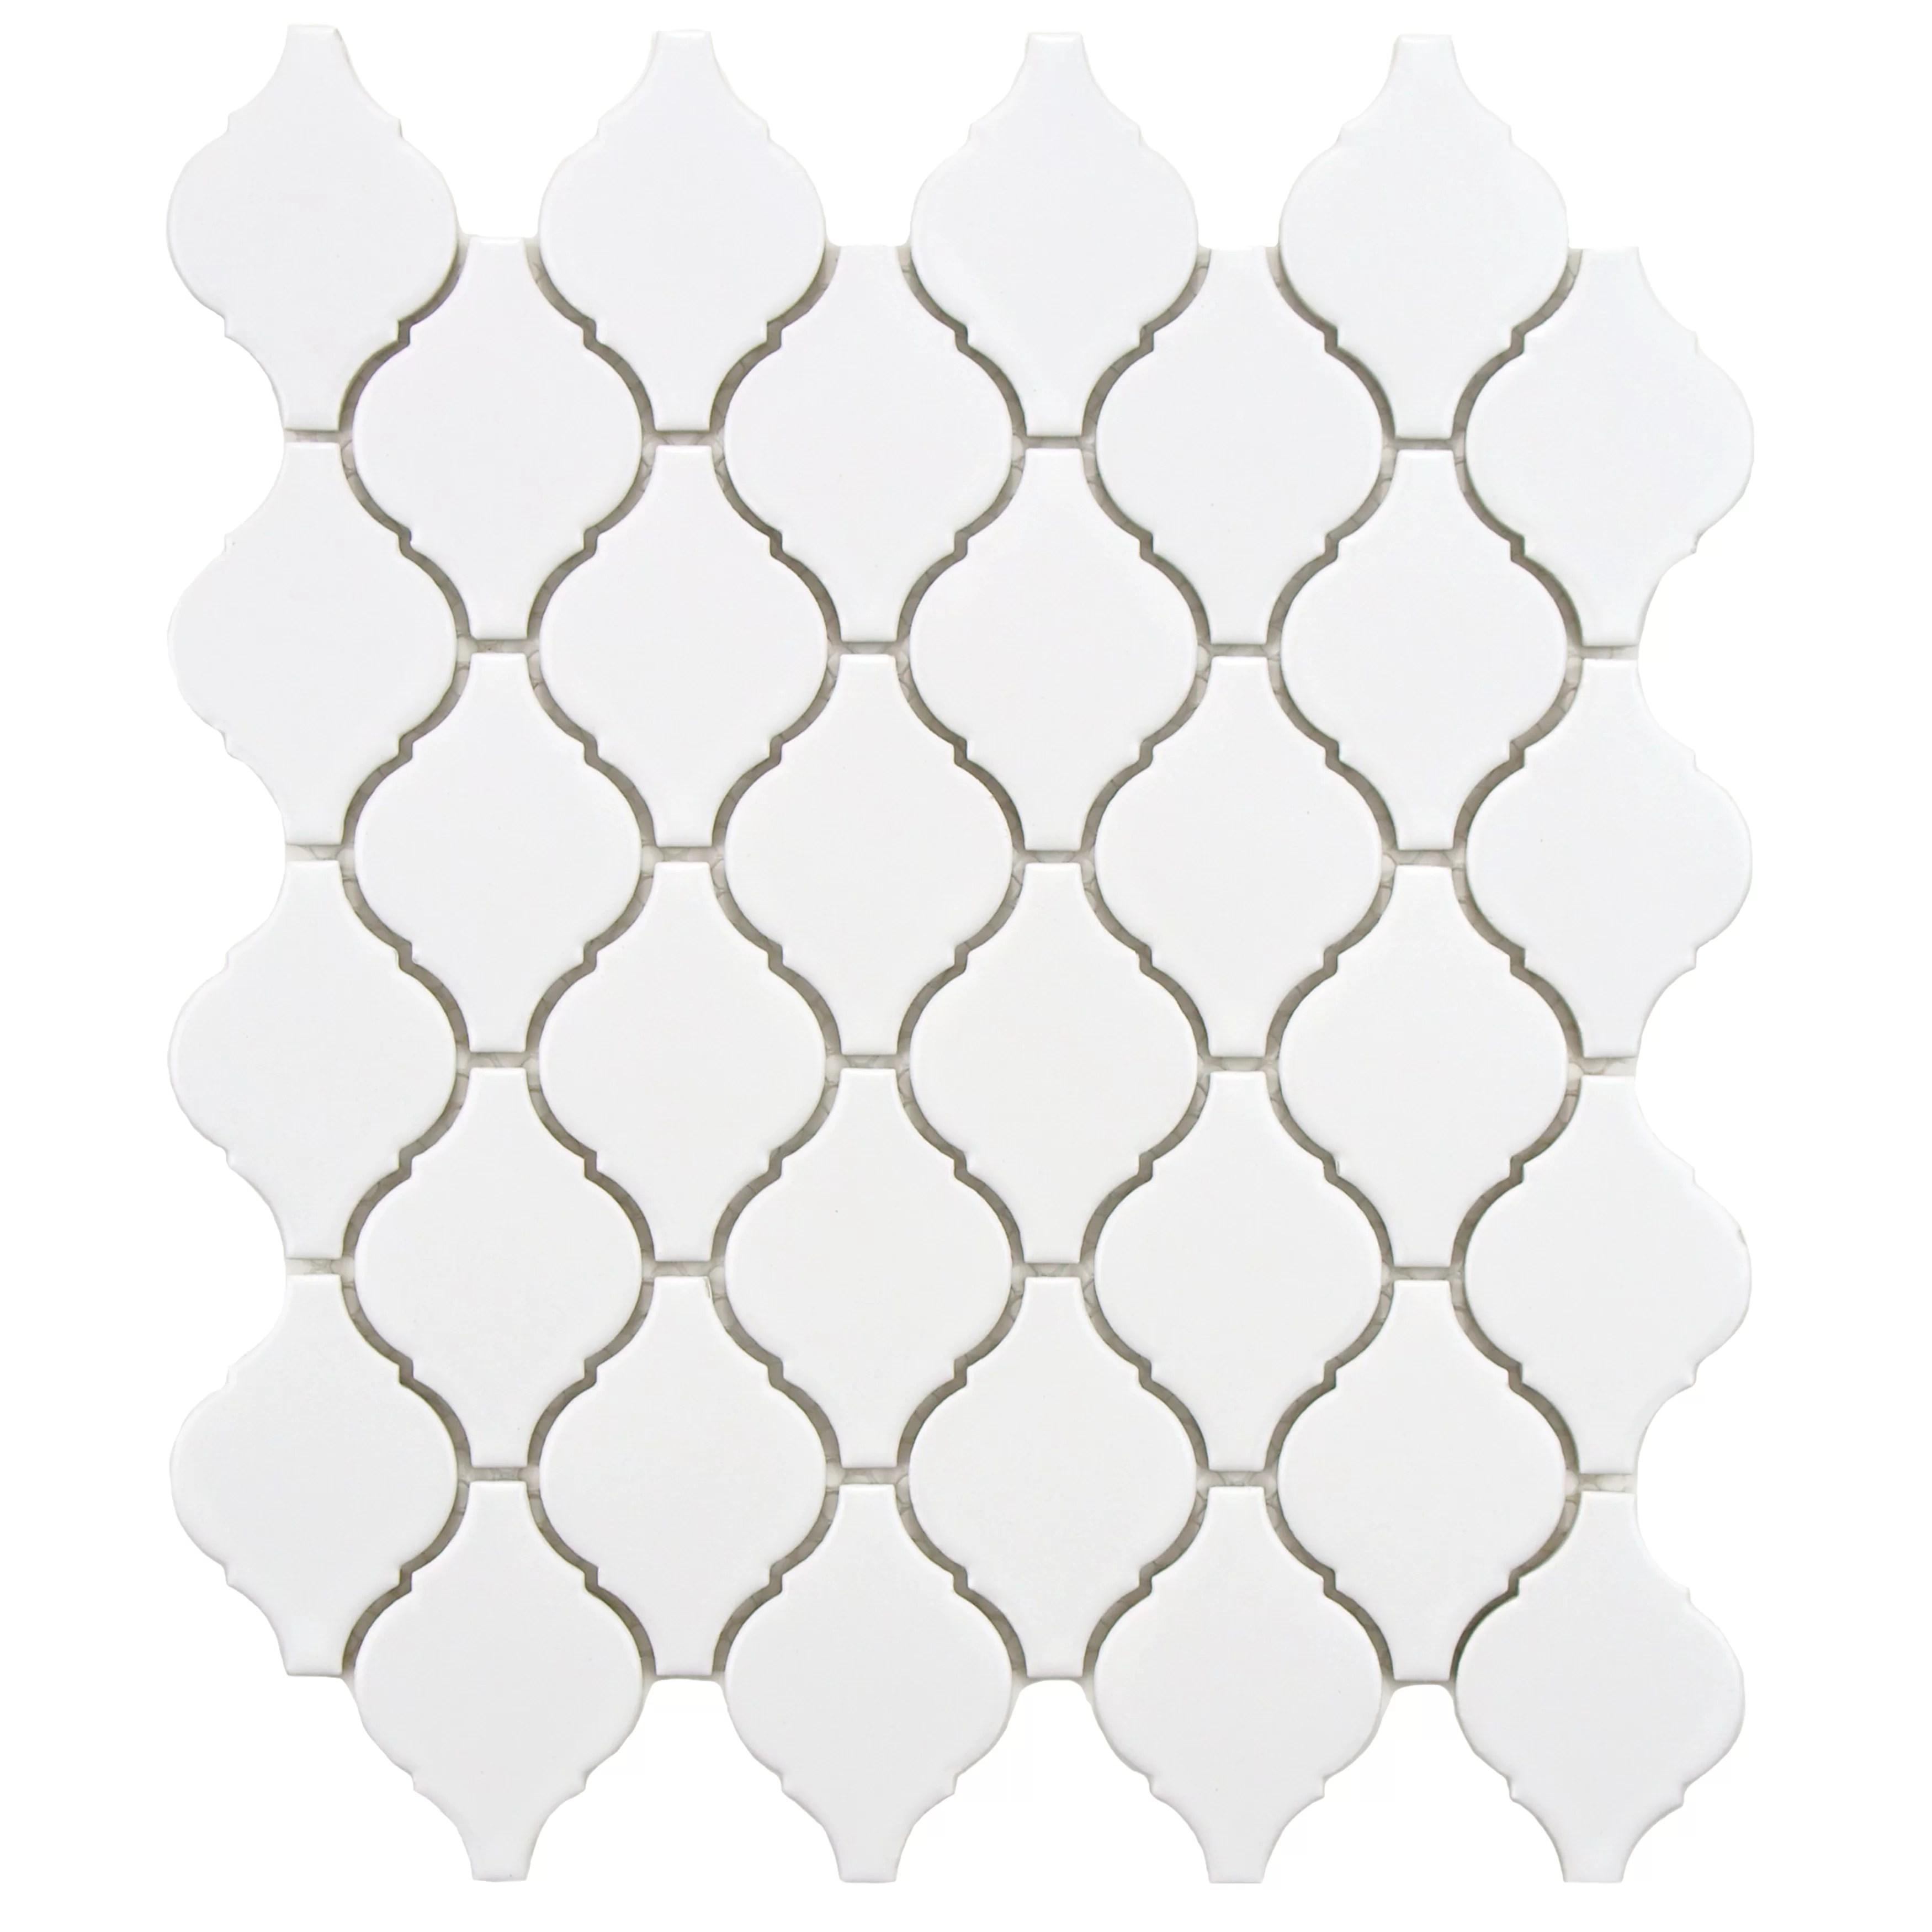 Elitetile Arabesque 1 87 X 2 75 Porcelain Mosaic Tile In